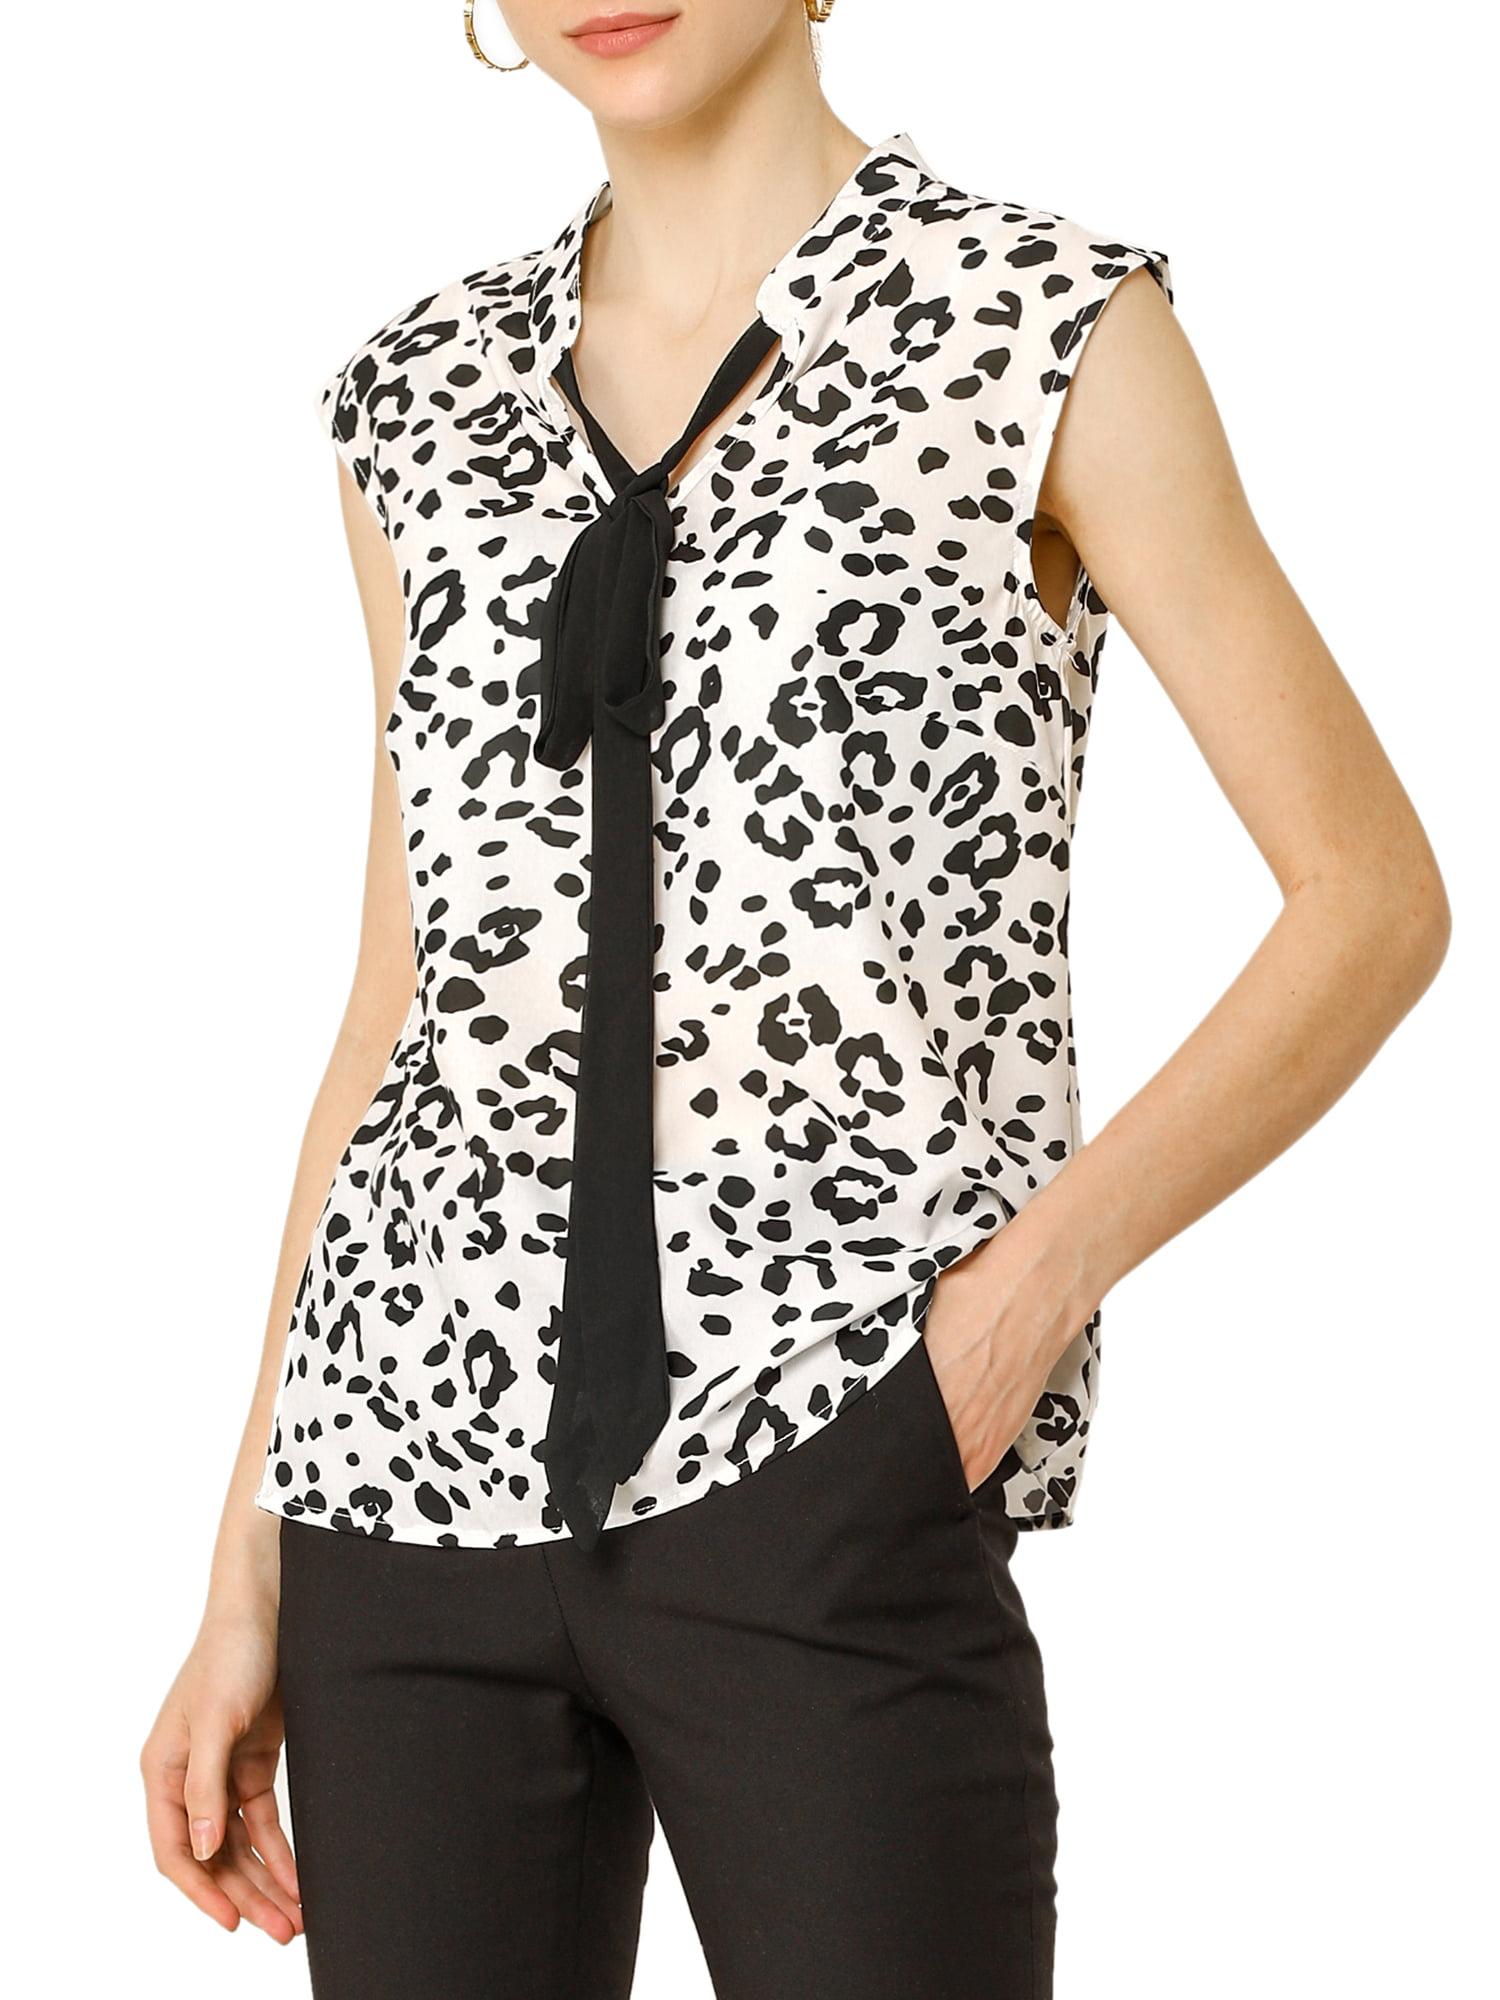 Plus Size 14-28 Womens  Leopard Print Sleeveless Collared Button Down Shirt